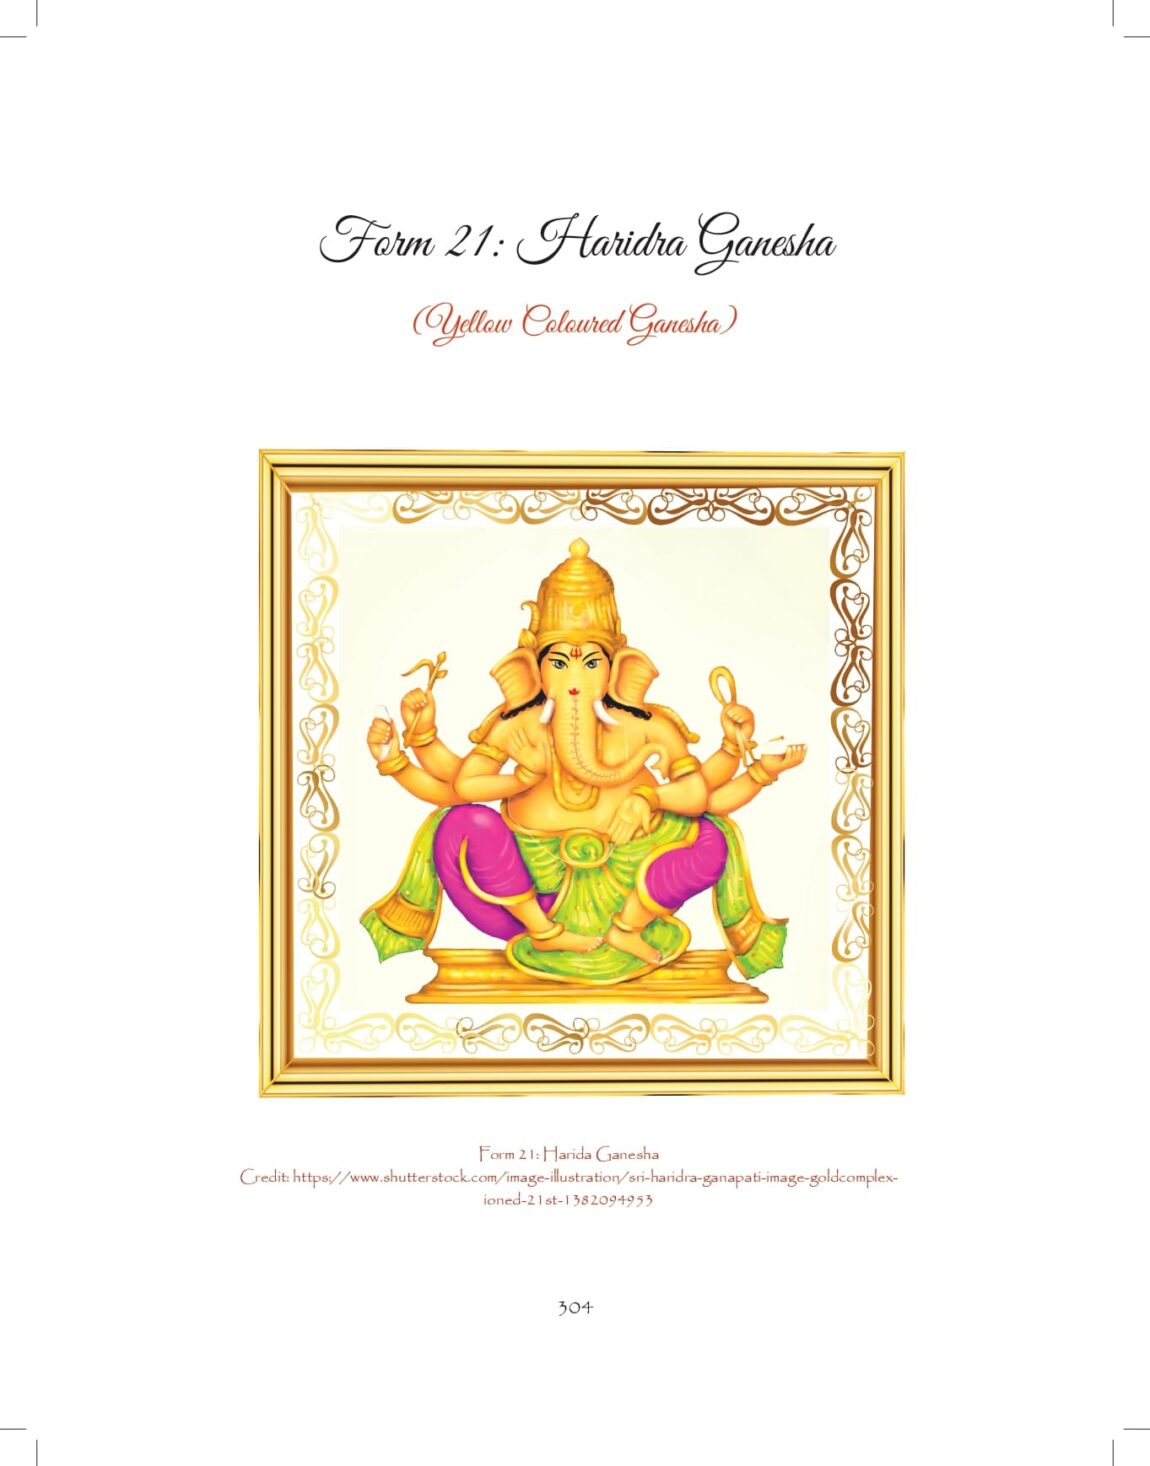 Ganesh-print_pages-to-jpg-0304.jpg